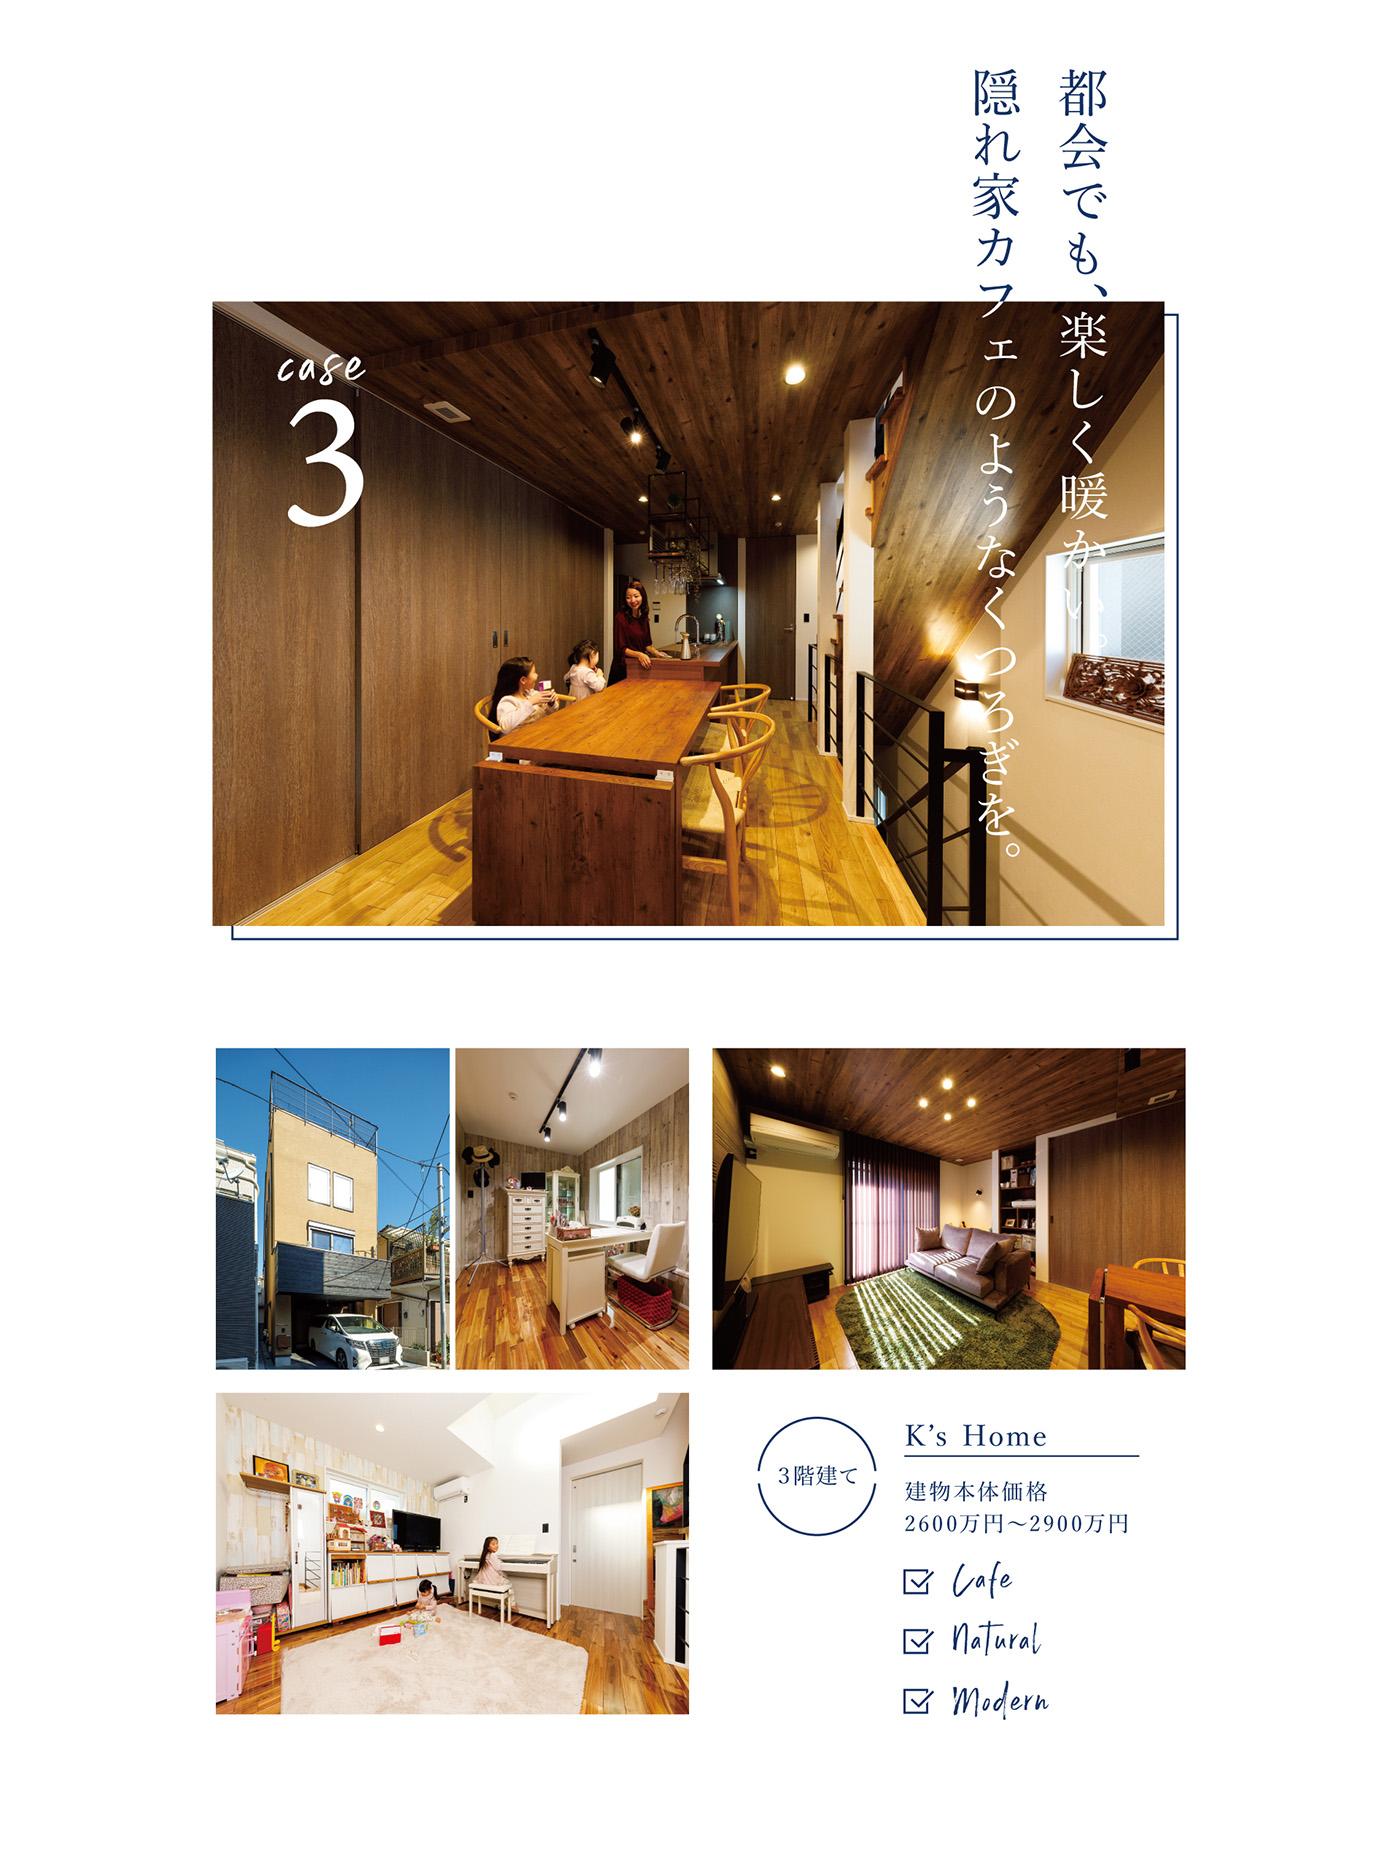 Case3; 都会でも、楽しく暖かい。隠れ家カフェのようなくつろぎを。2600万円~2900万円。Cafe / Natural / Modern